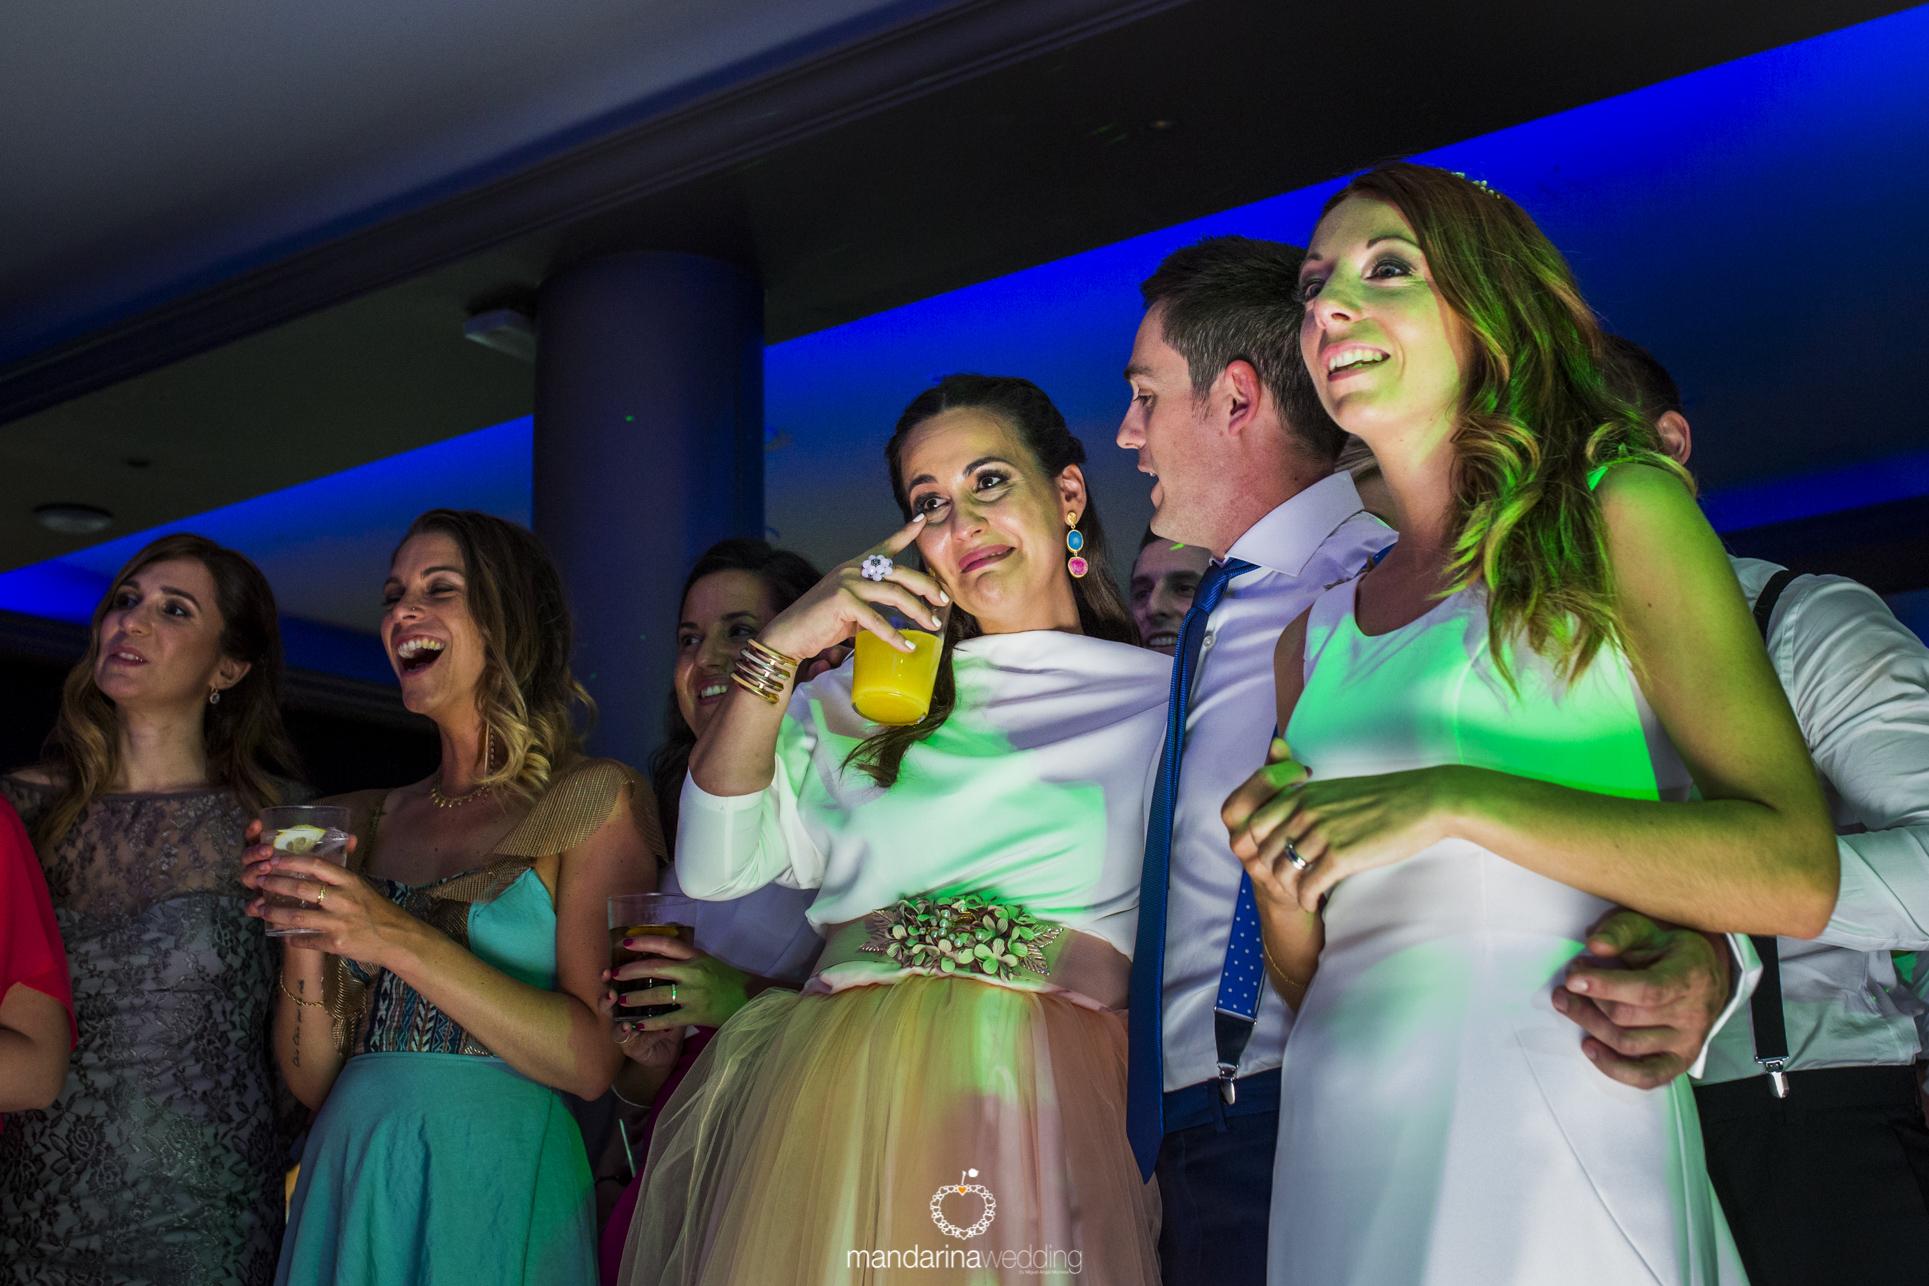 mandarina wedding, fotografo boda pais vasco, fotografo boda zaragoza, fotógrafo boda soria, fotografo boda Madrid, fotógrafo boda tarragona-18